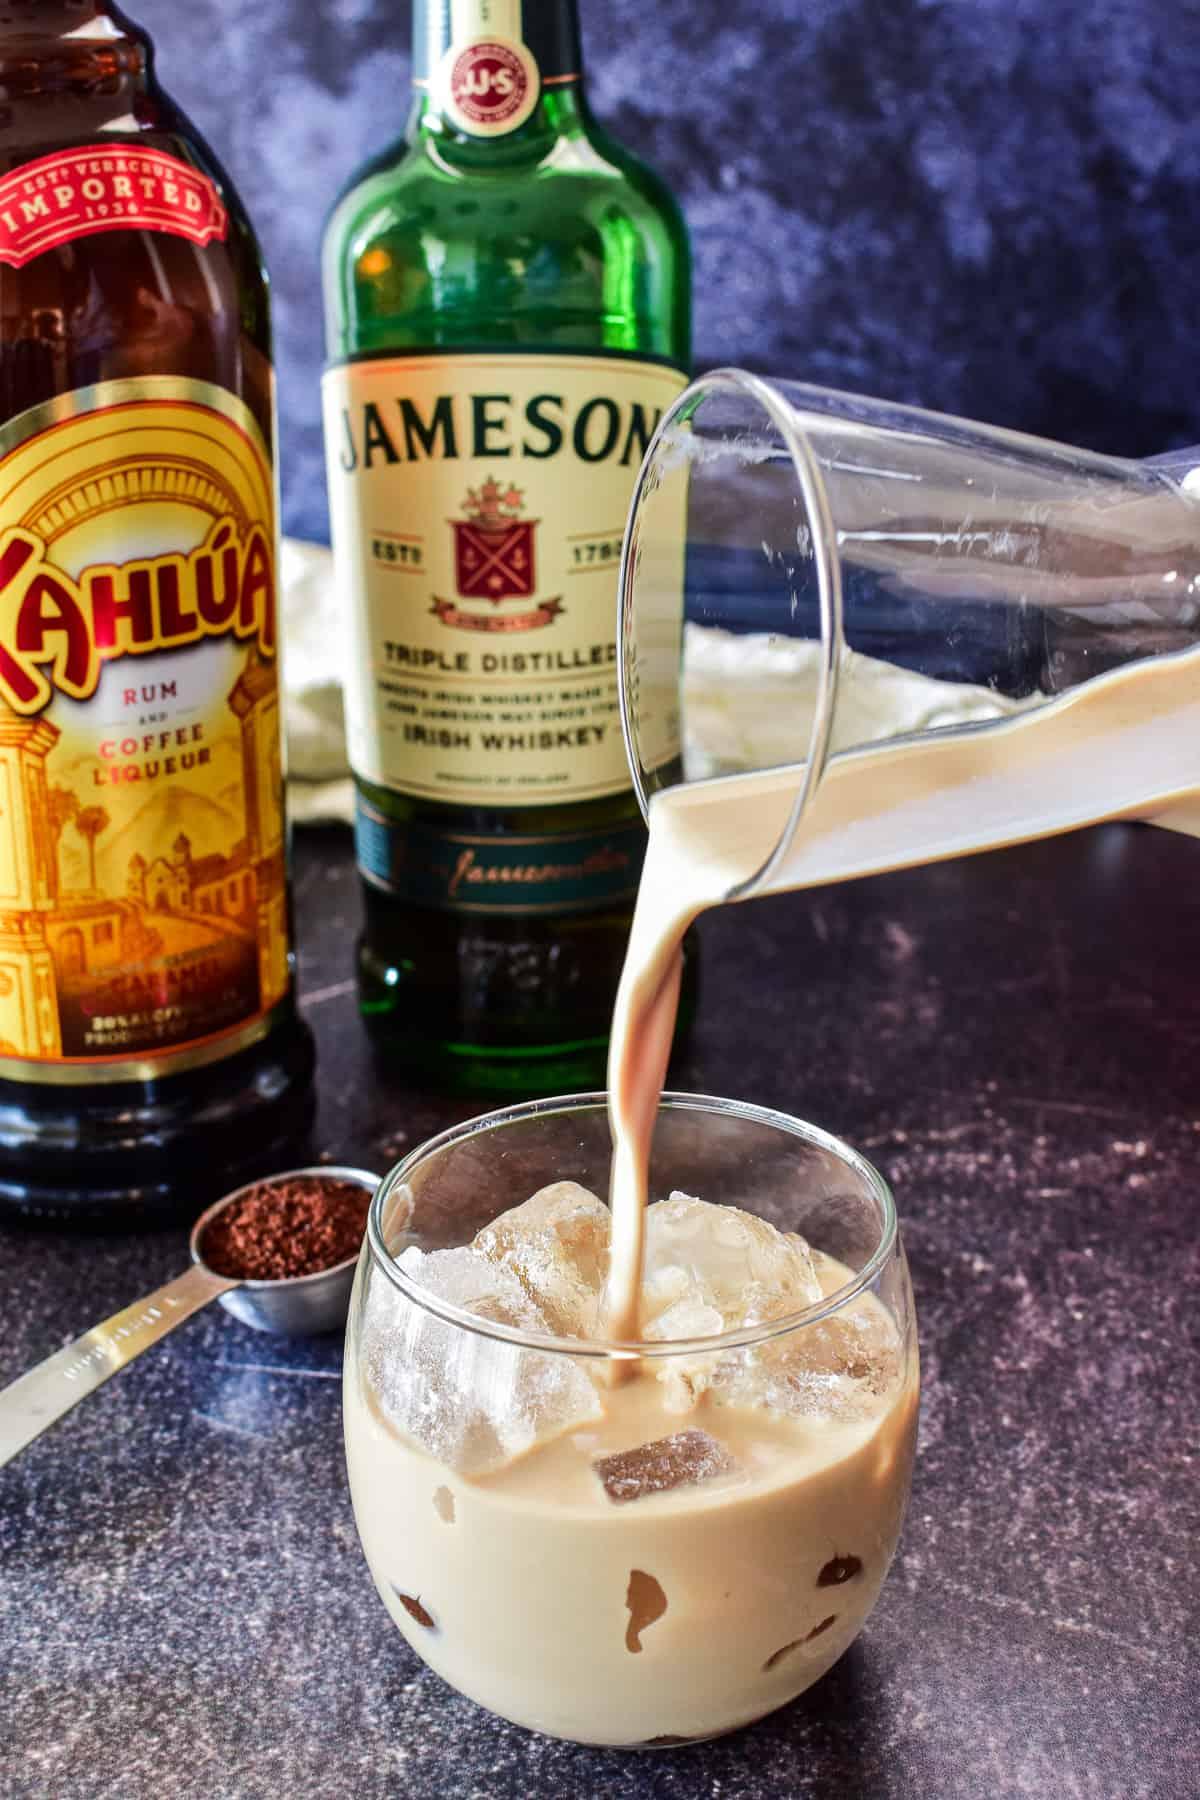 Pouring Irish Cream over ice